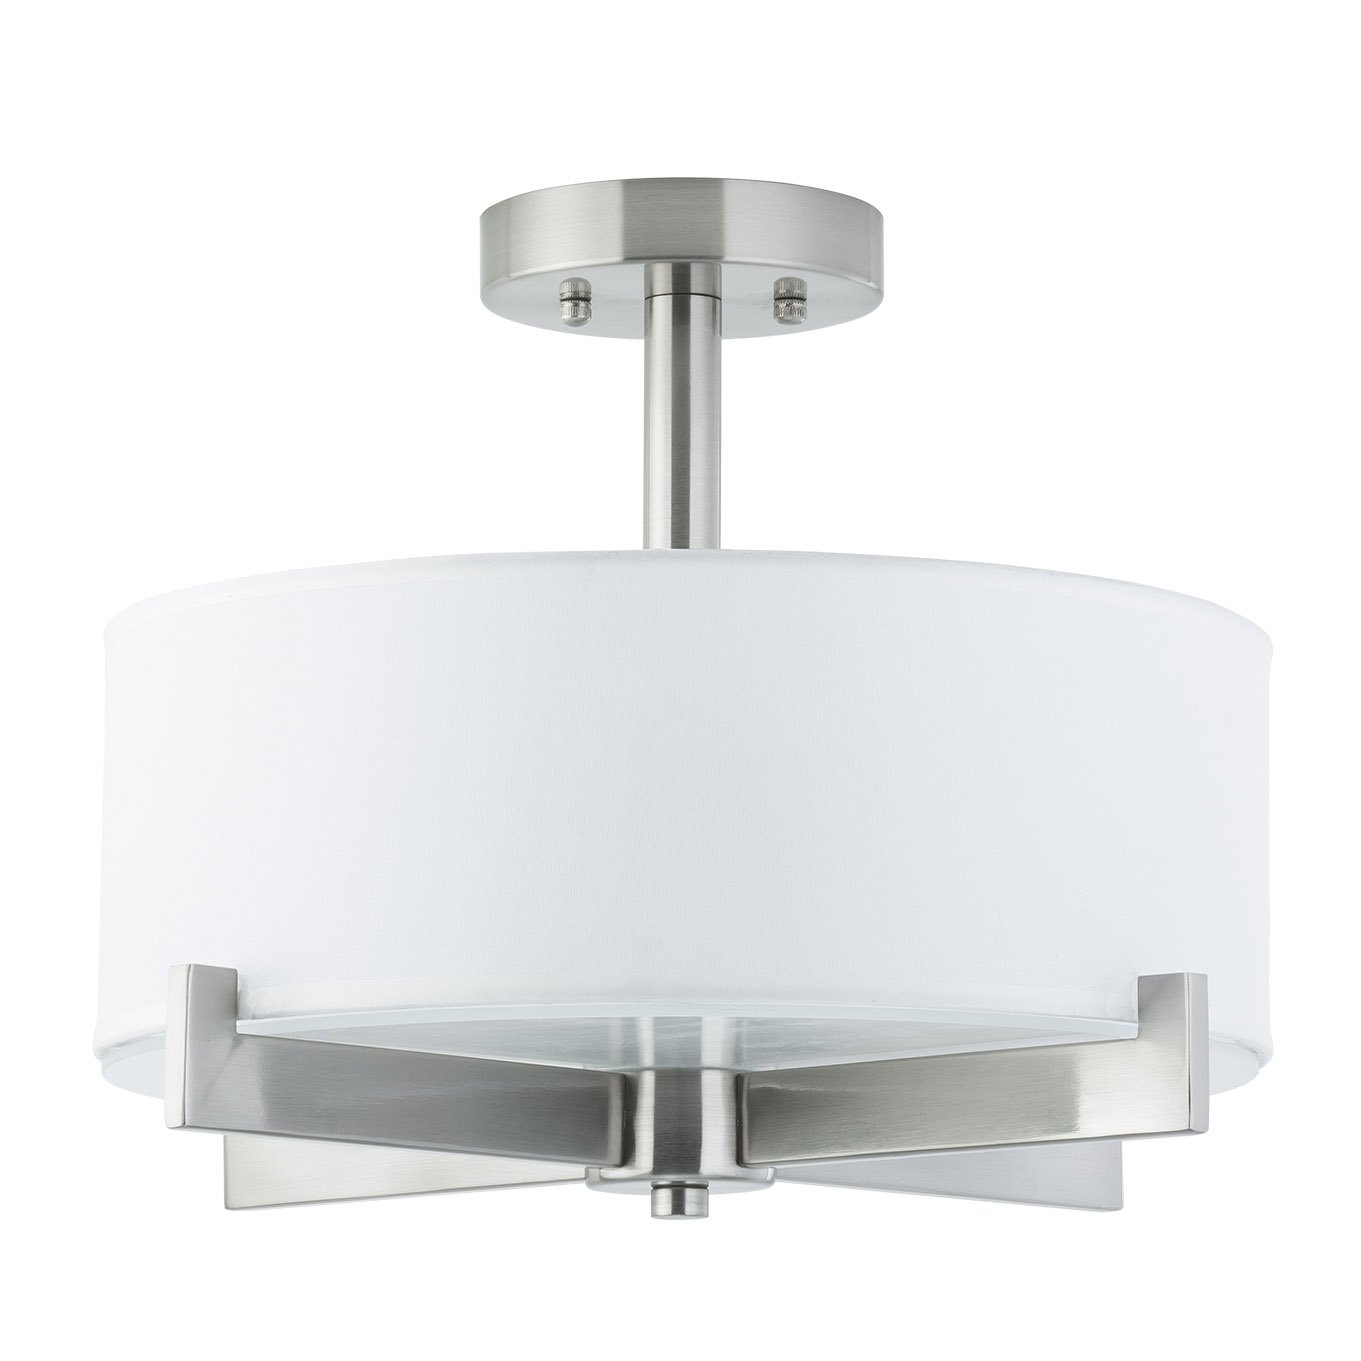 Allegro Semi Flush Mount Ceiling Light - Brushed Nickel - Fabric Shade - Linea di Liara LL-C132-BN by Linea di Liara